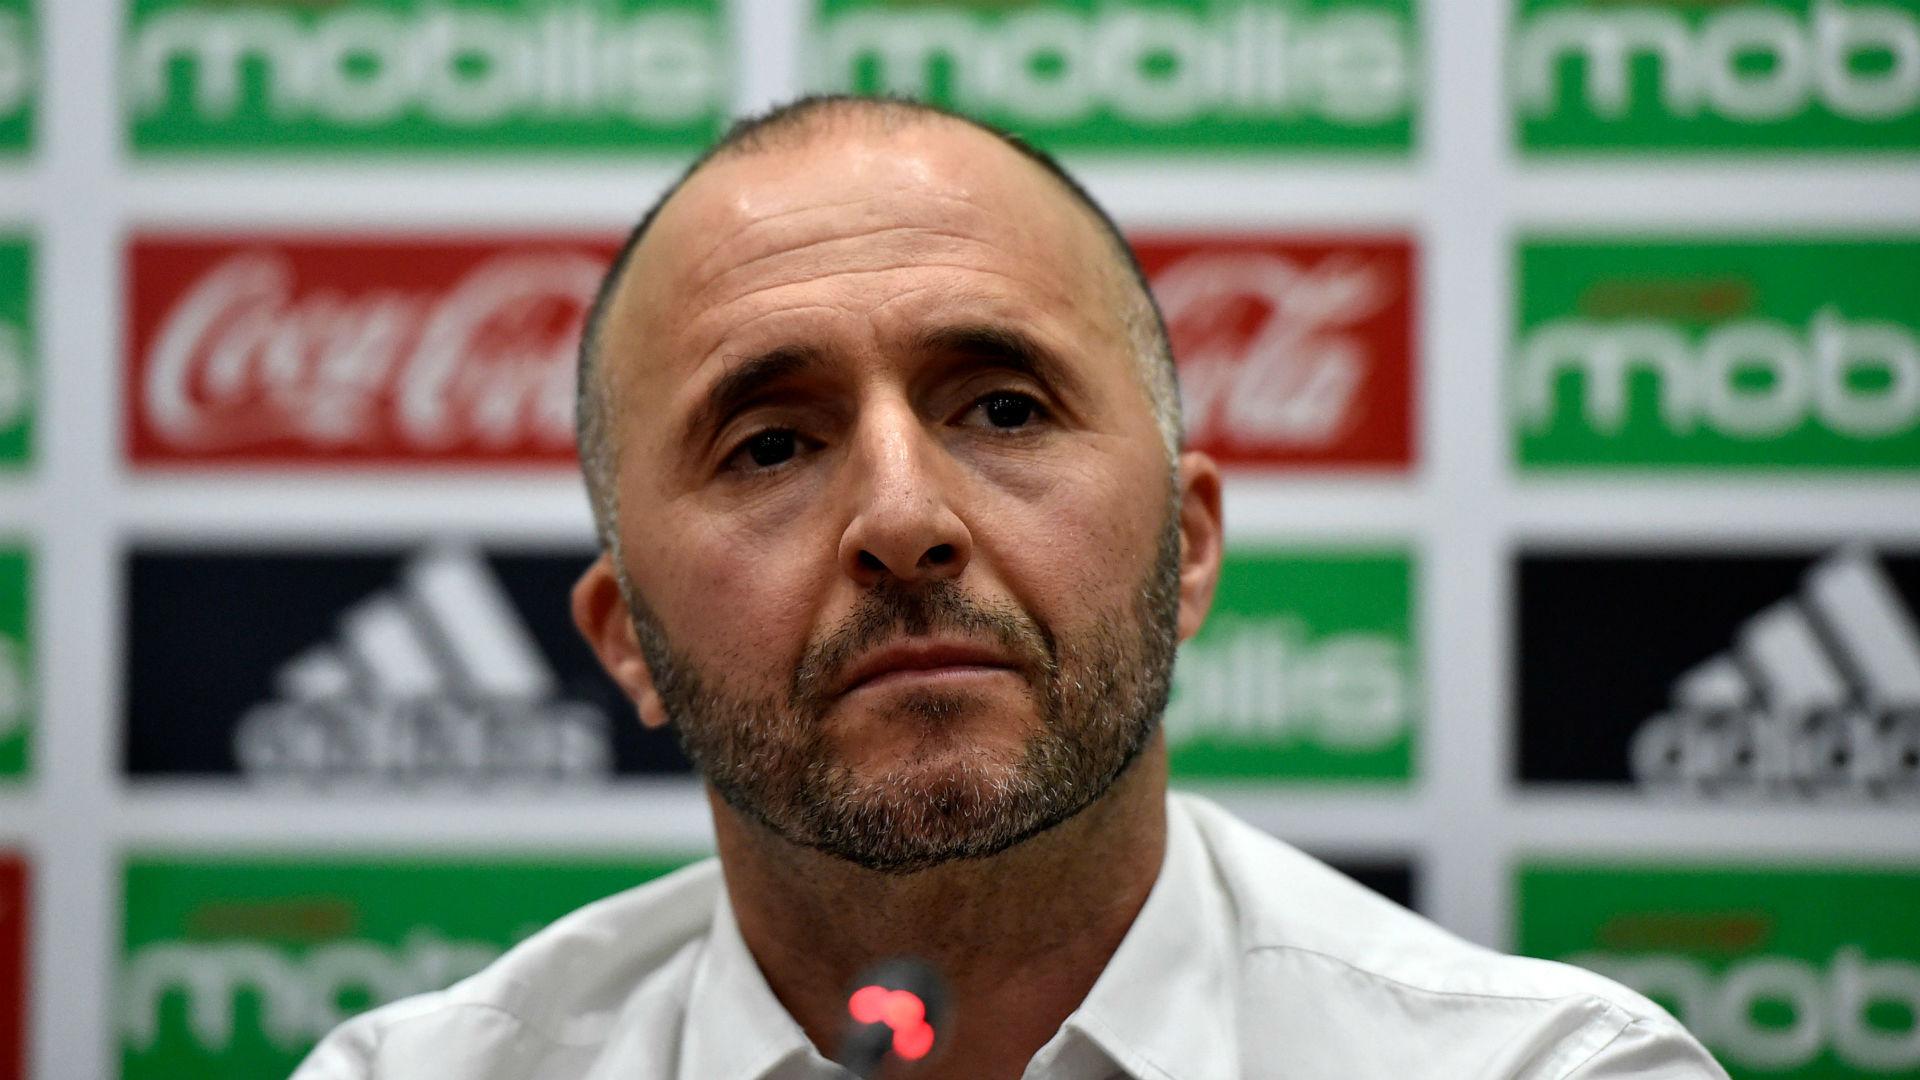 Algeria coach Djamel Belmadi: Burundi play with a similar style as Kenya